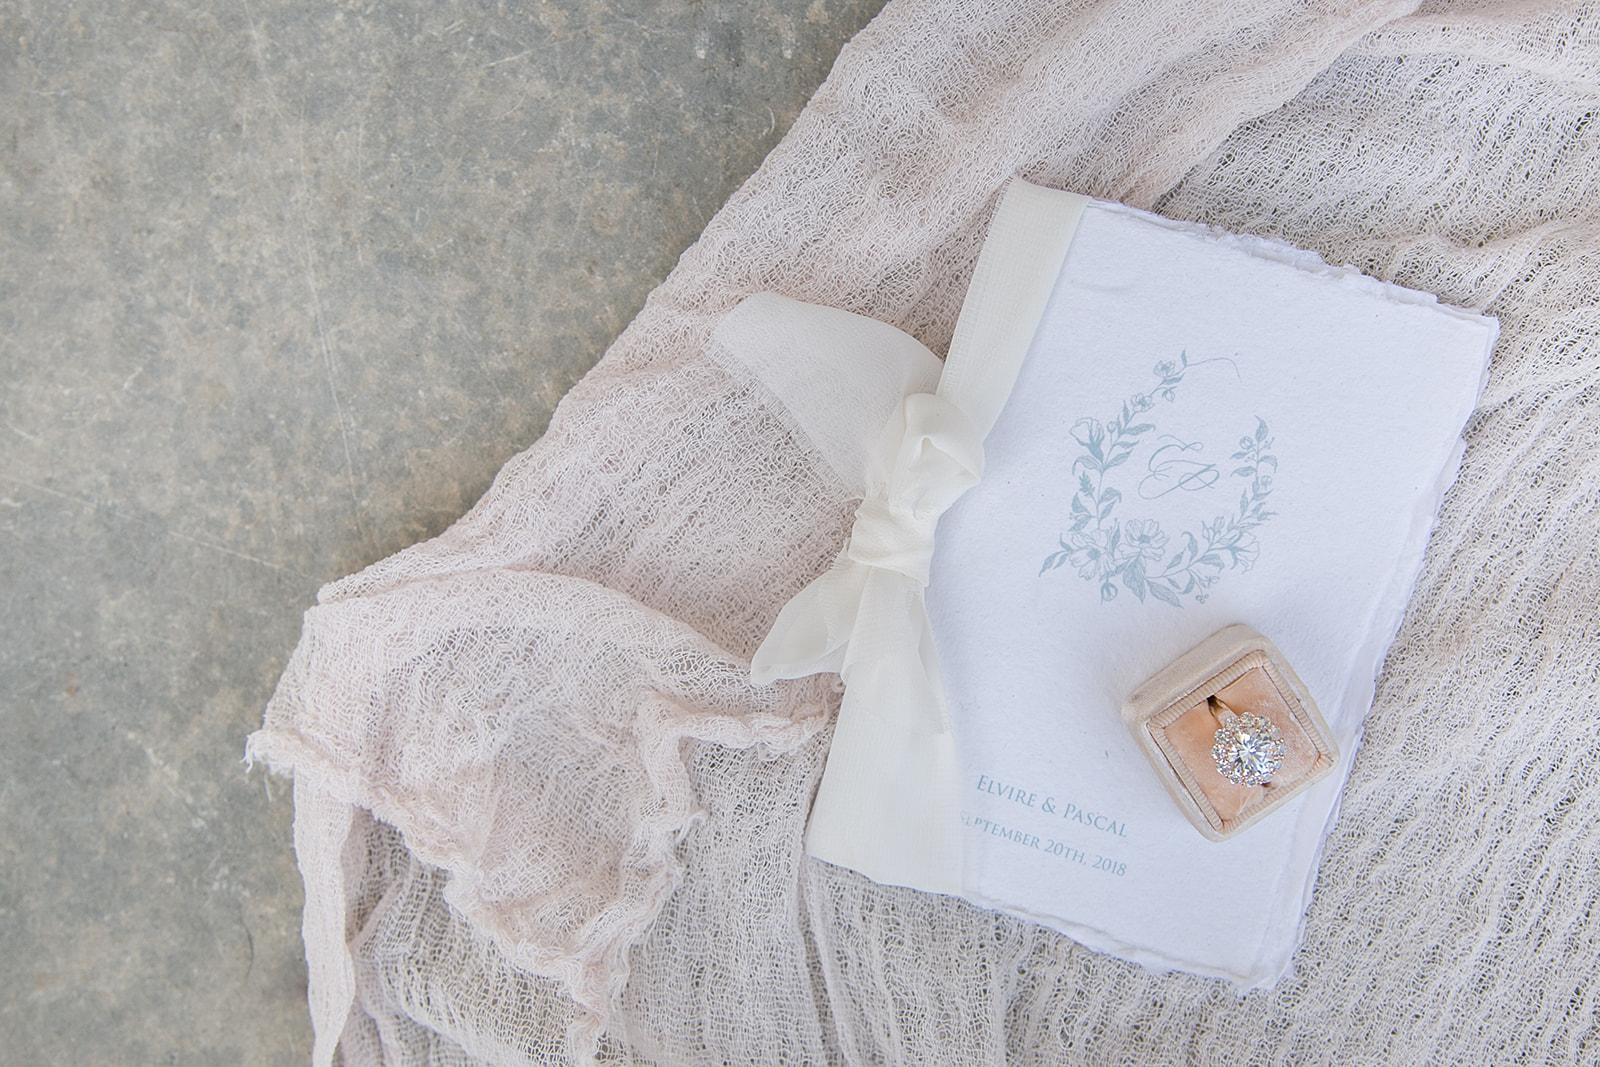 pretty wedding ring and invitation flatlay ideas using gauze table runners